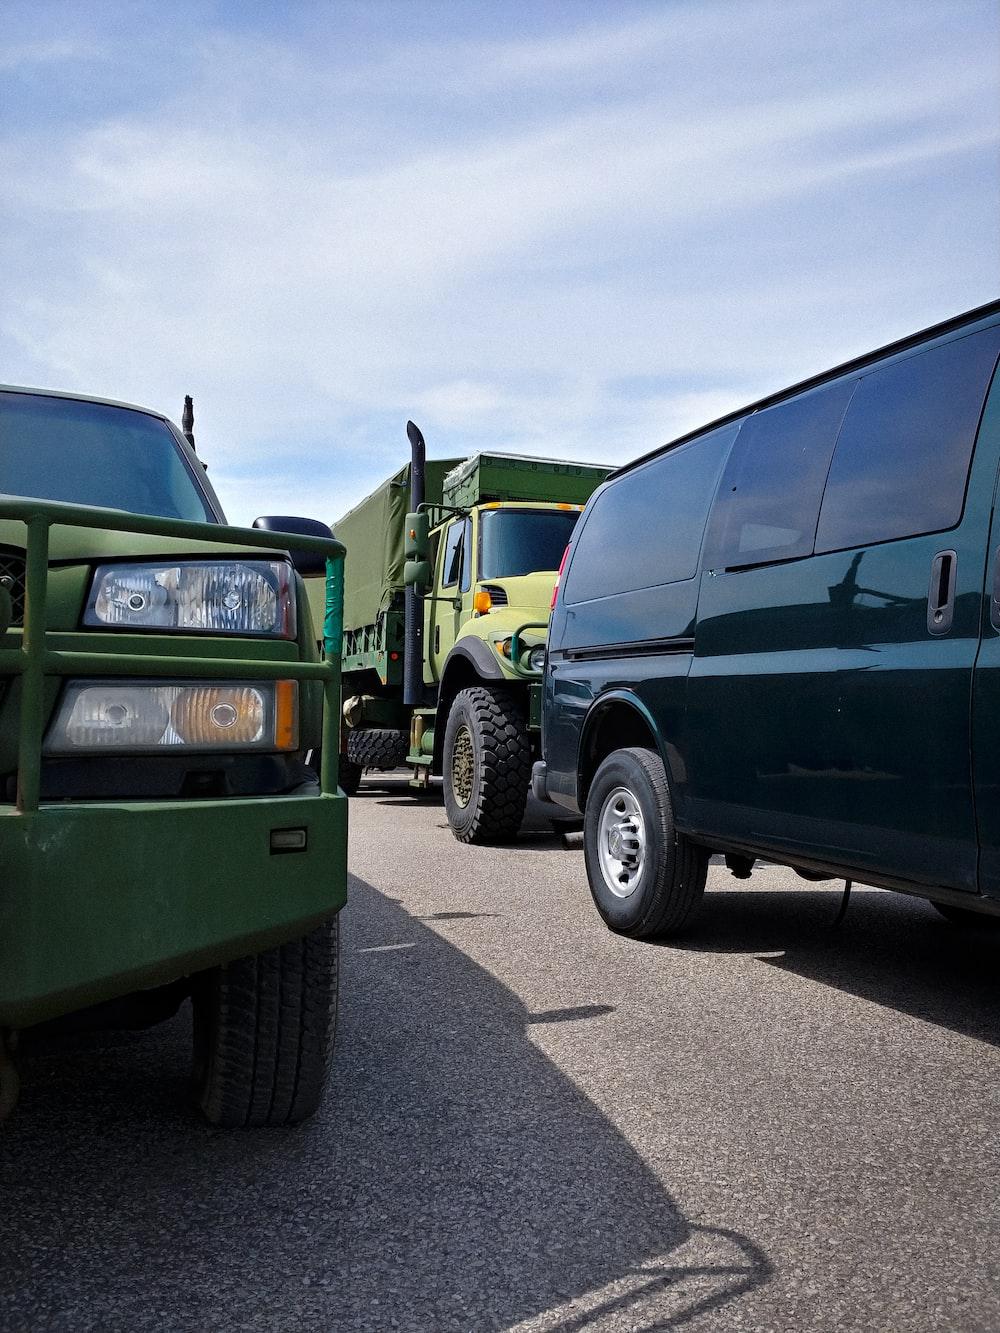 green and black van on gray asphalt road during daytime